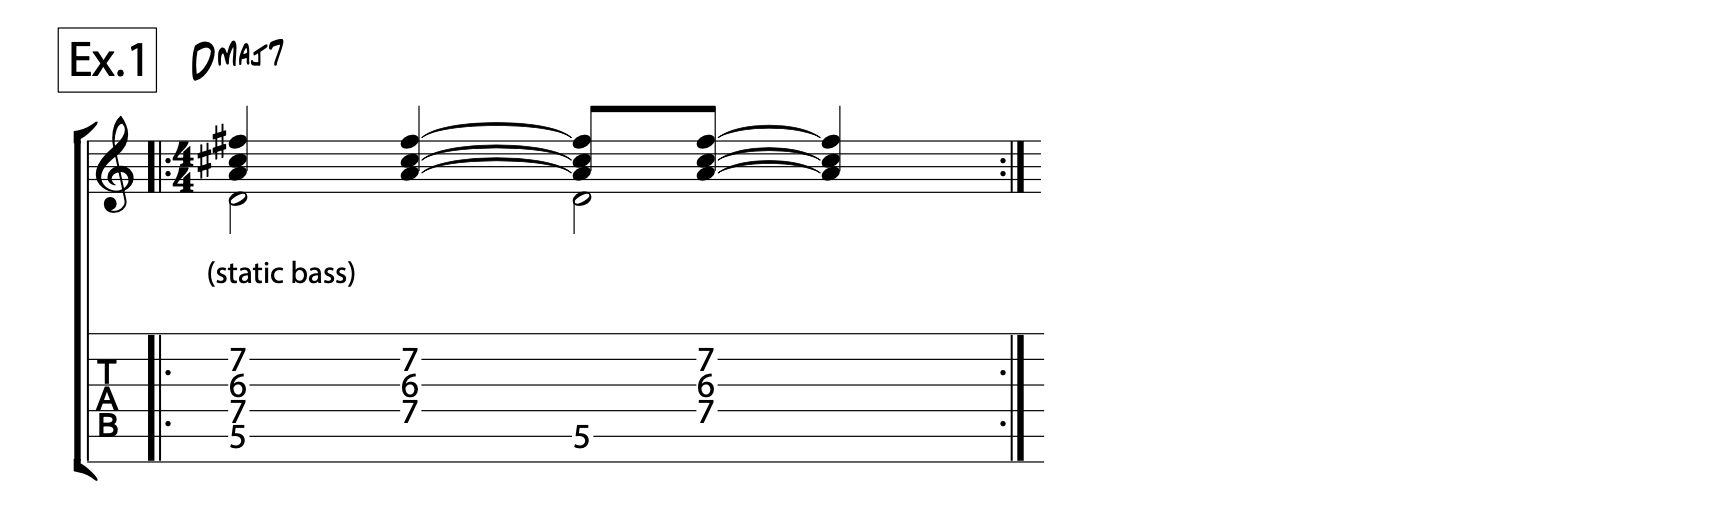 1-bossa-nova-chords-progression